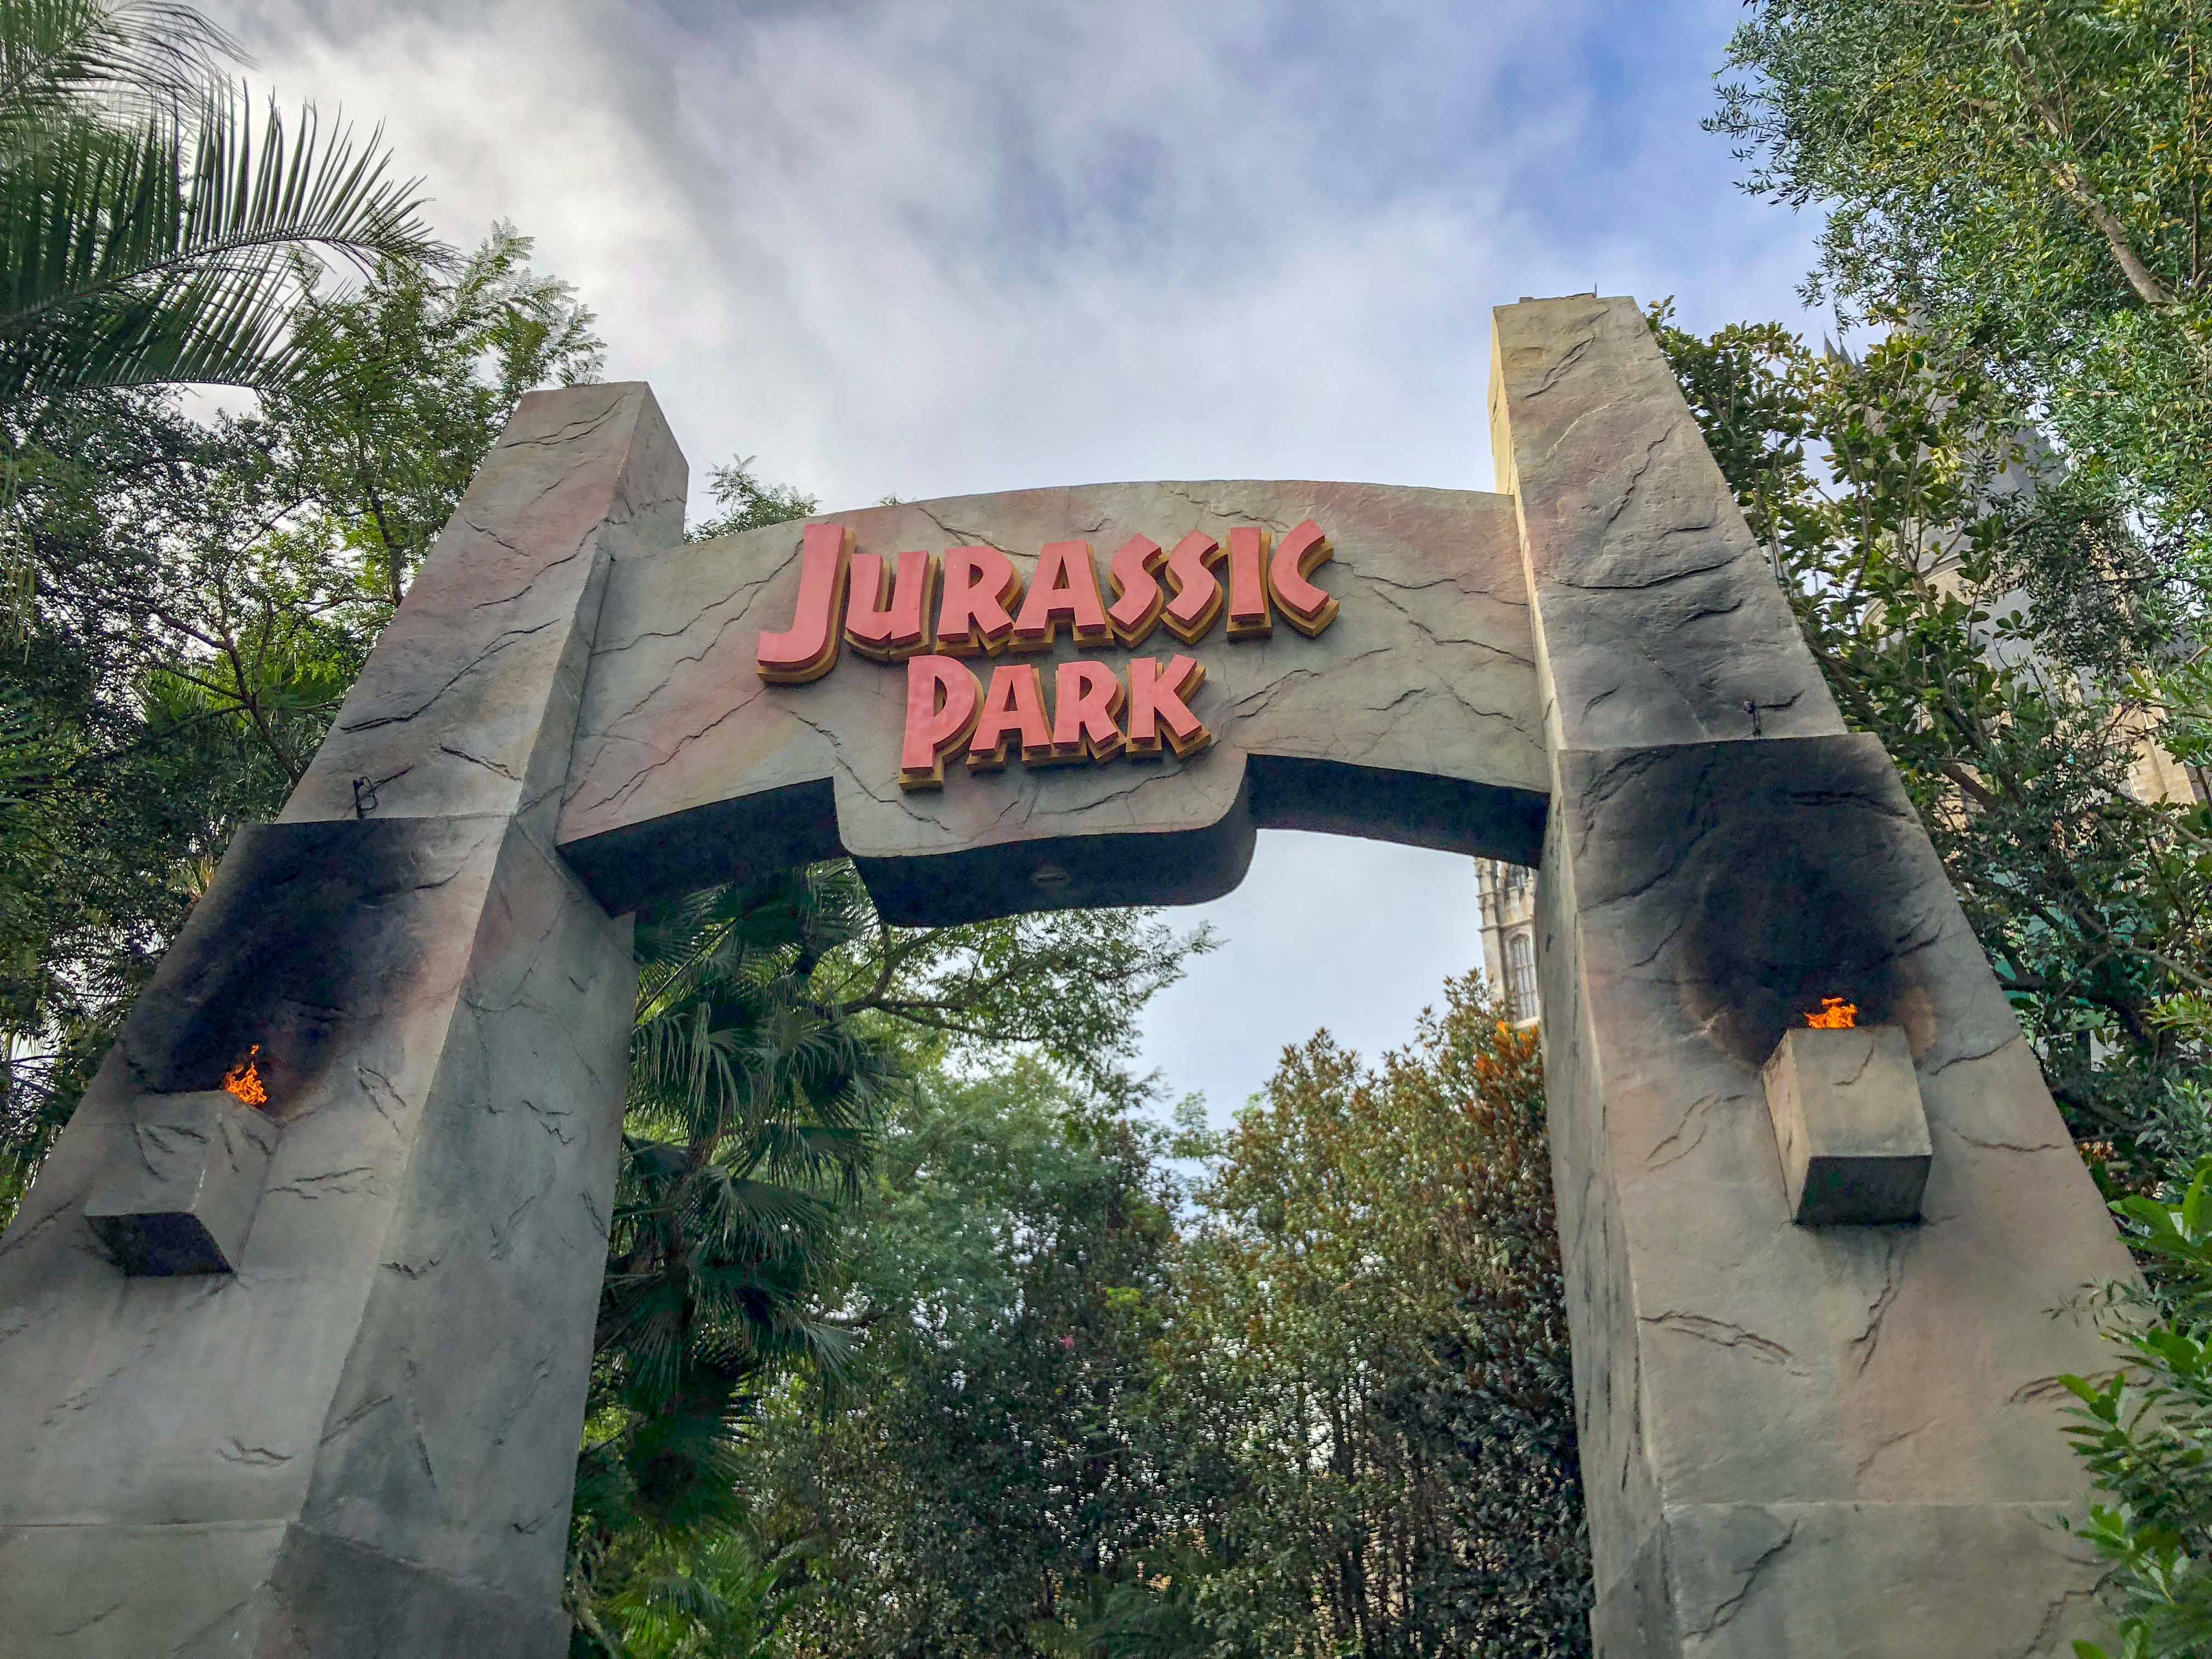 Jurrasic Park Gate Universal Islands Adventure Orlando